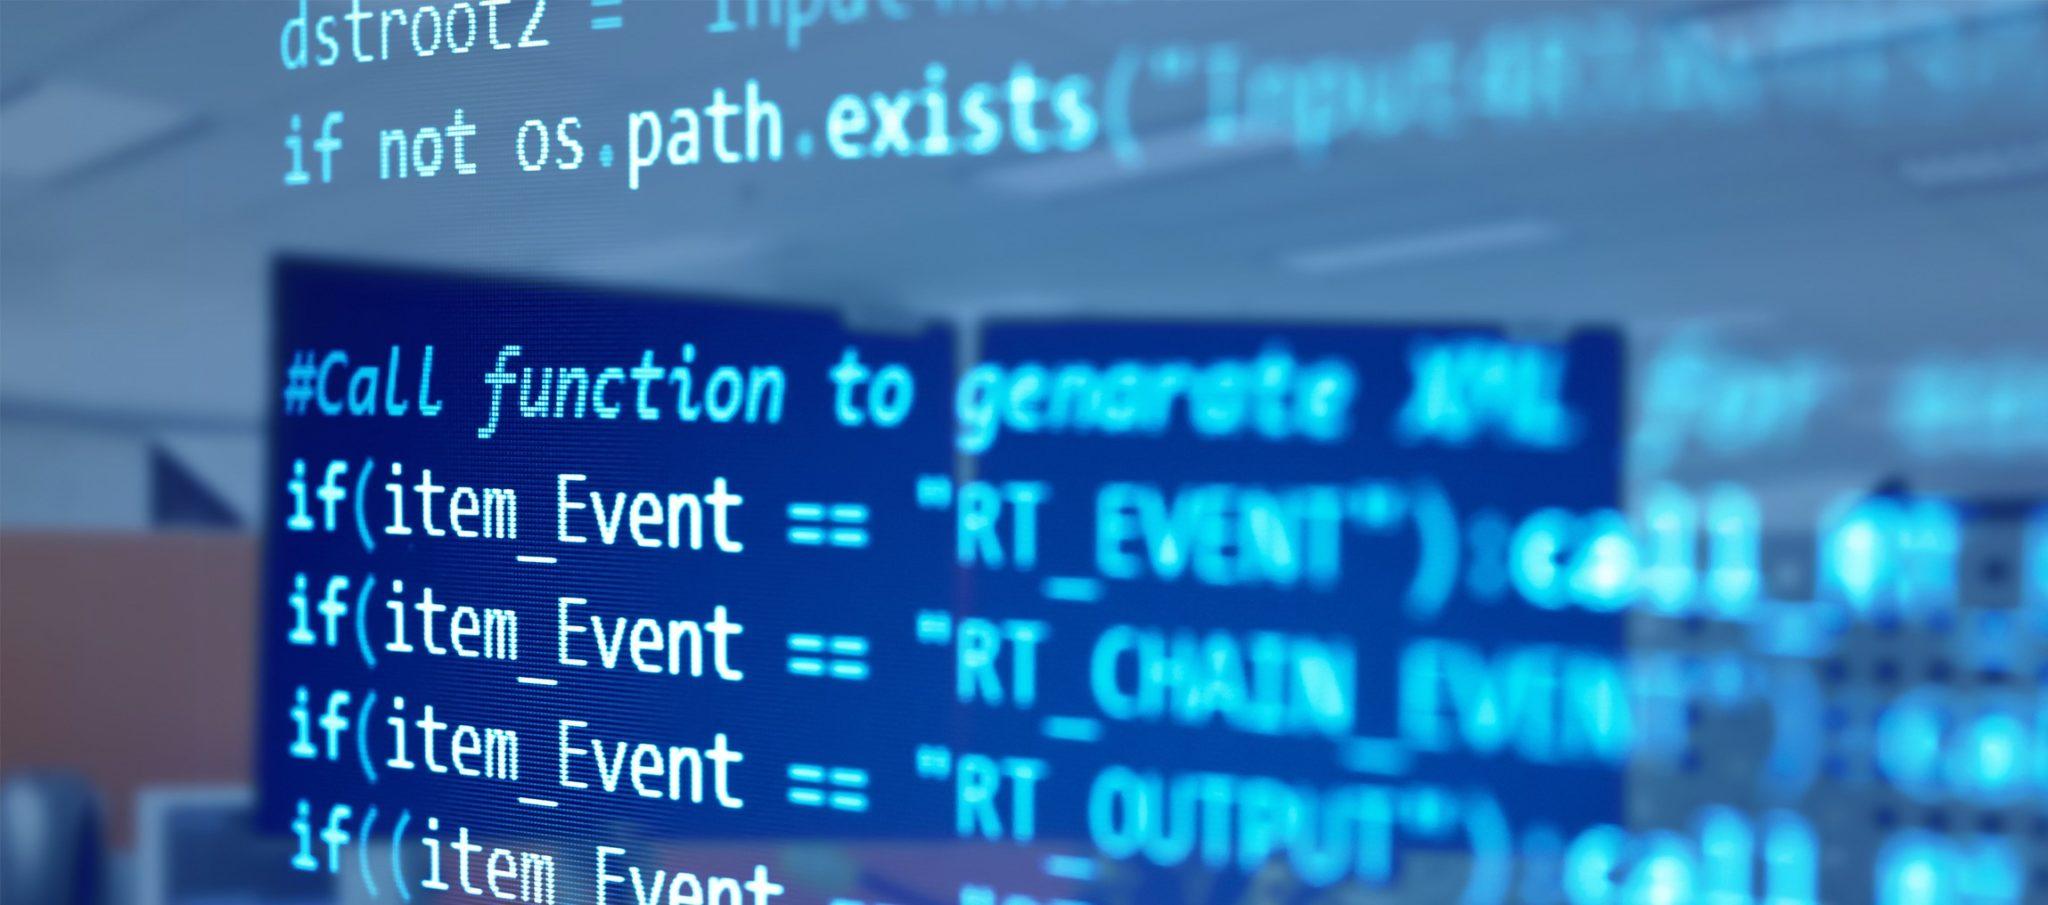 Webinar 'Accelerate the digital transformation – Introduction'